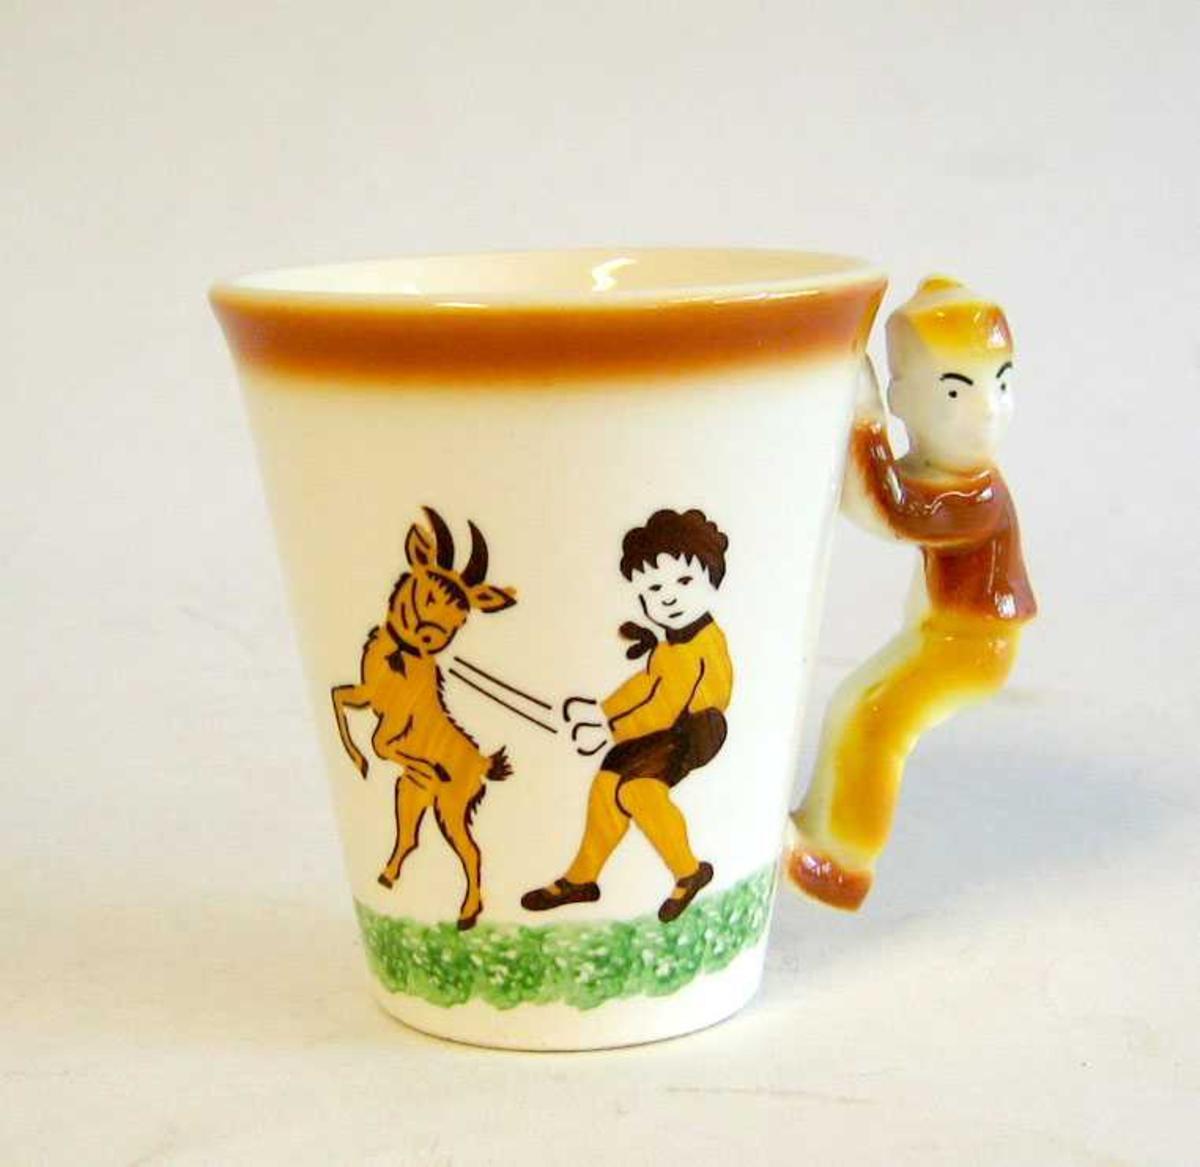 Kjegleforma kopp med handtak i forma av ein gut/person